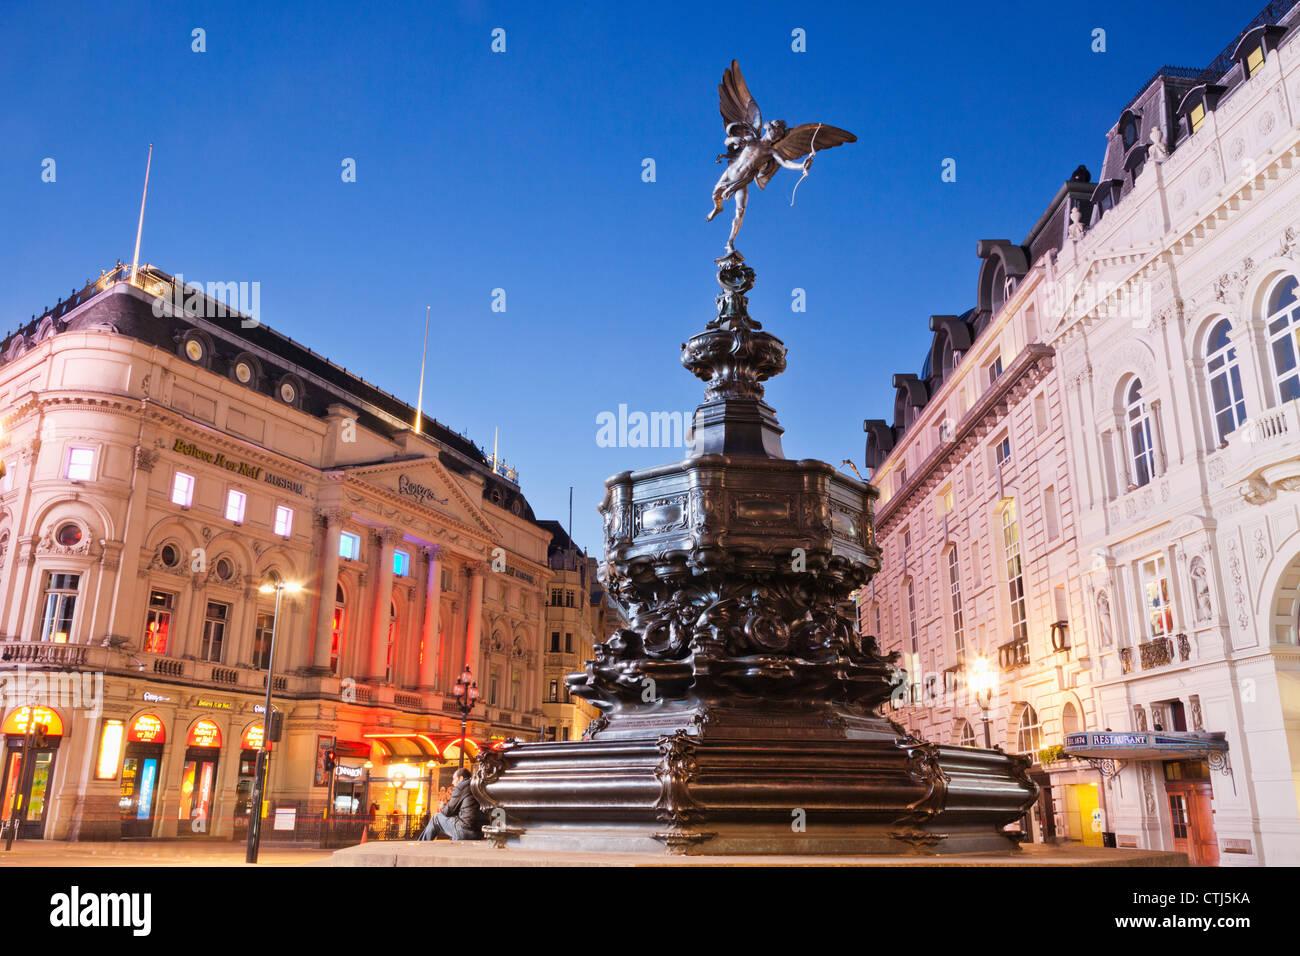 England, London, Soho, Piccadilly Circus, Eros Statue - Stock Image